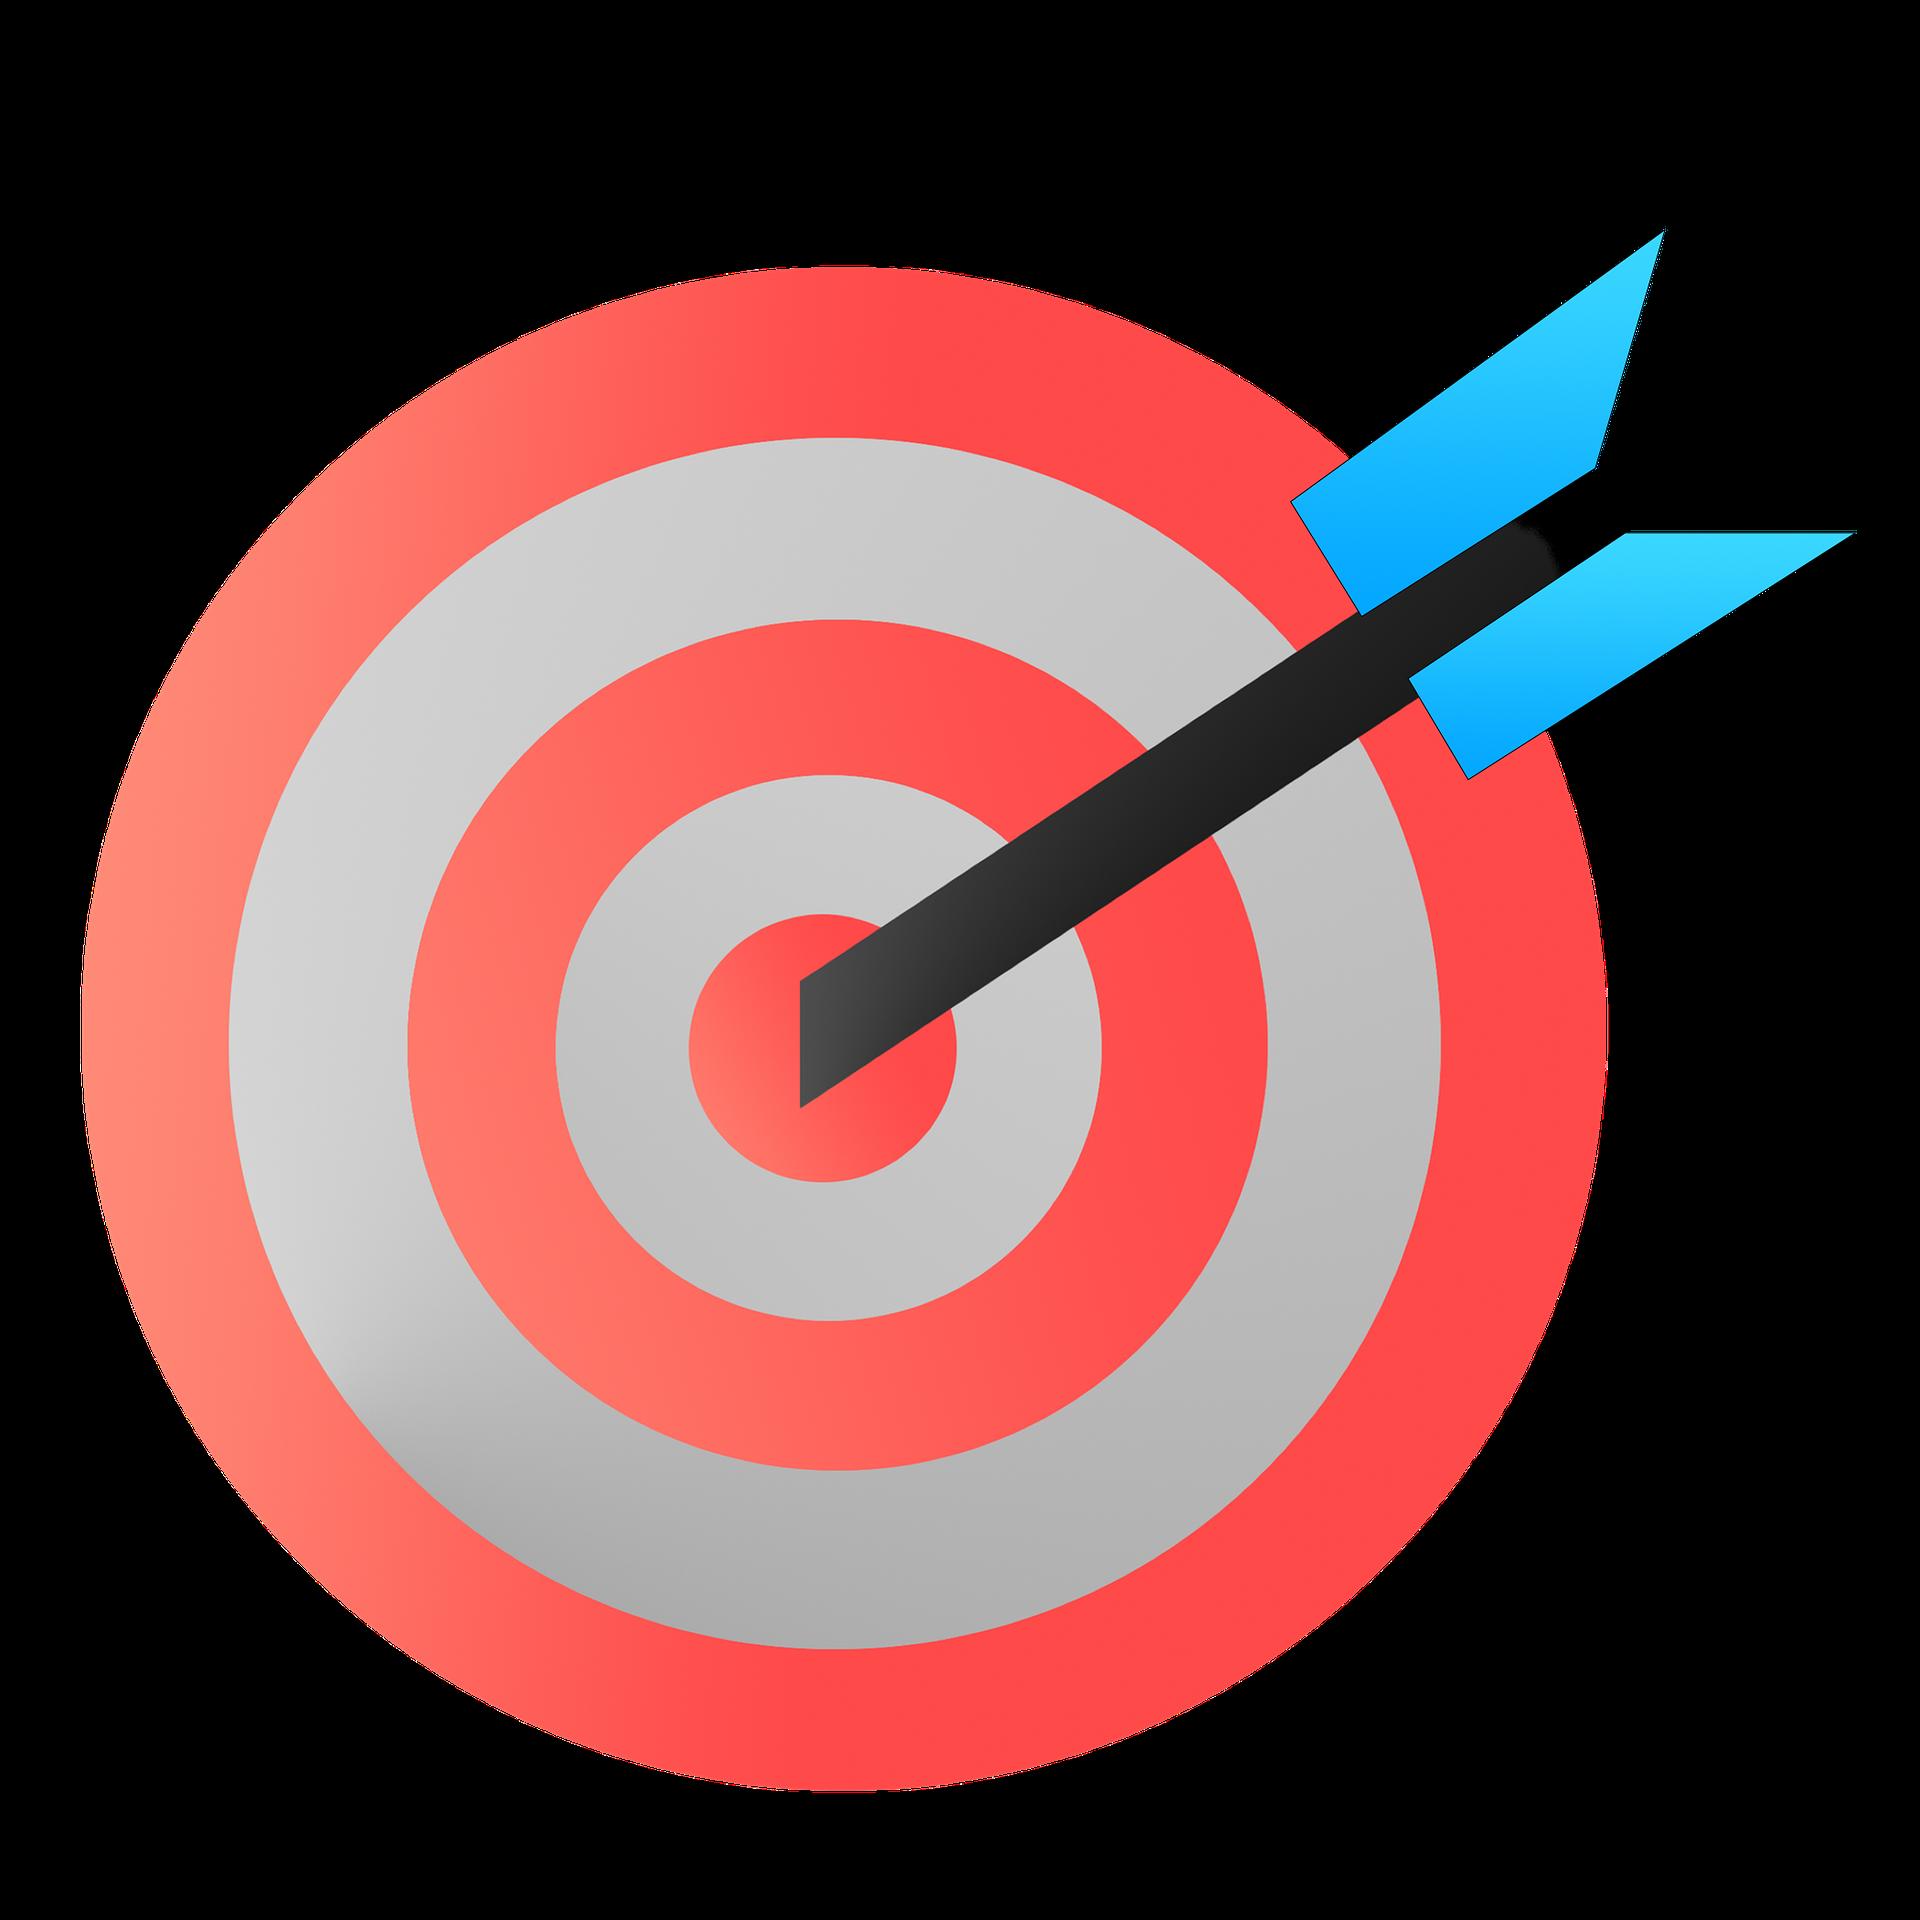 Goal clipart accuracy. And precision clip art